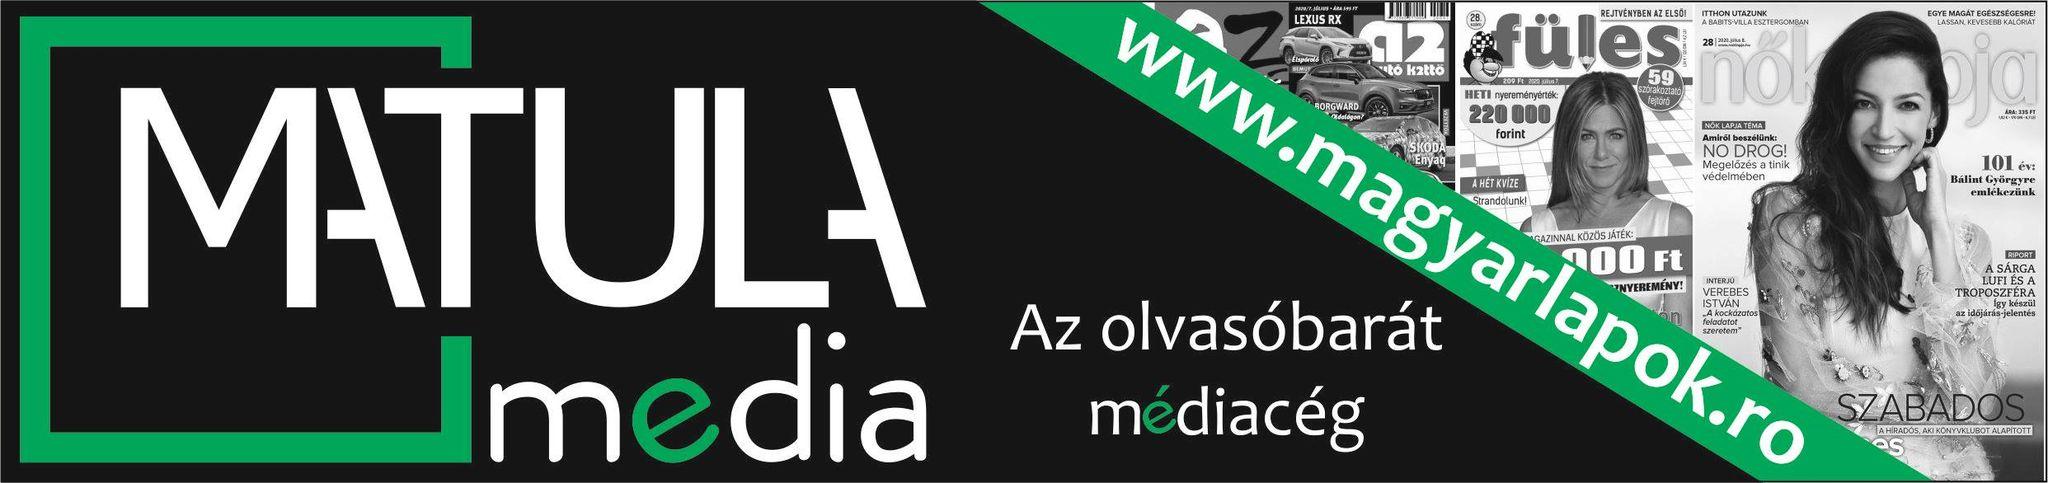 Matula média